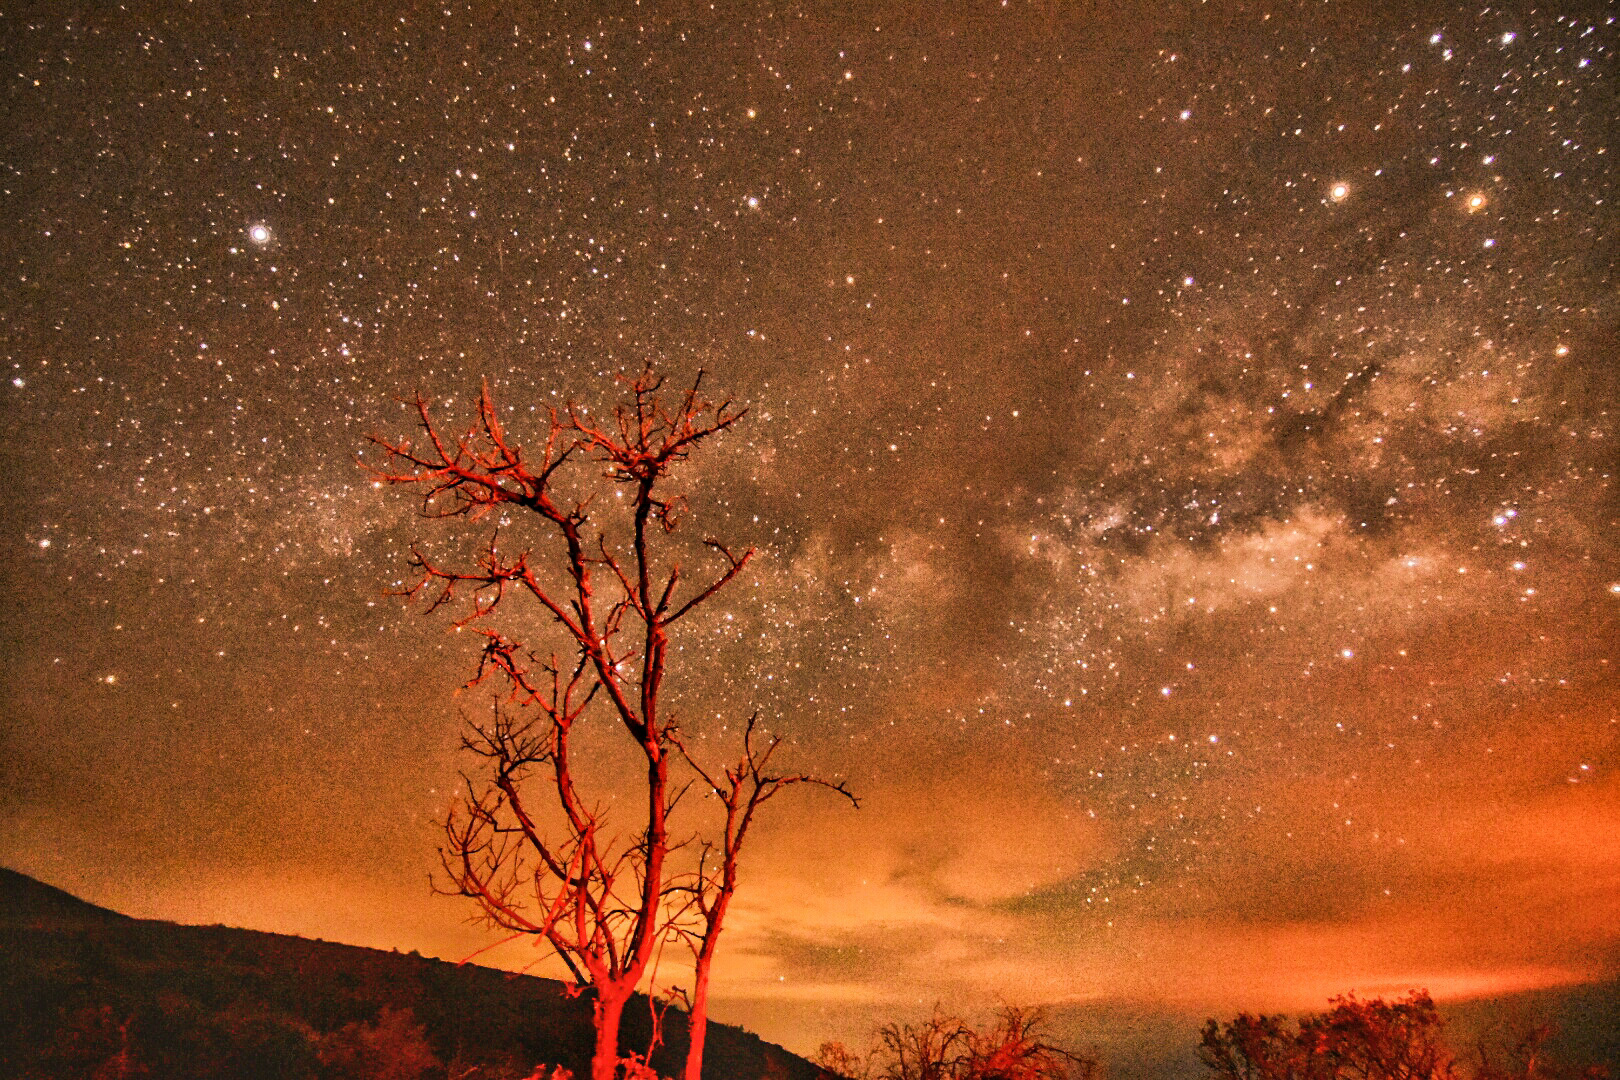 Mauna Kea Milky Way by Mike Beck